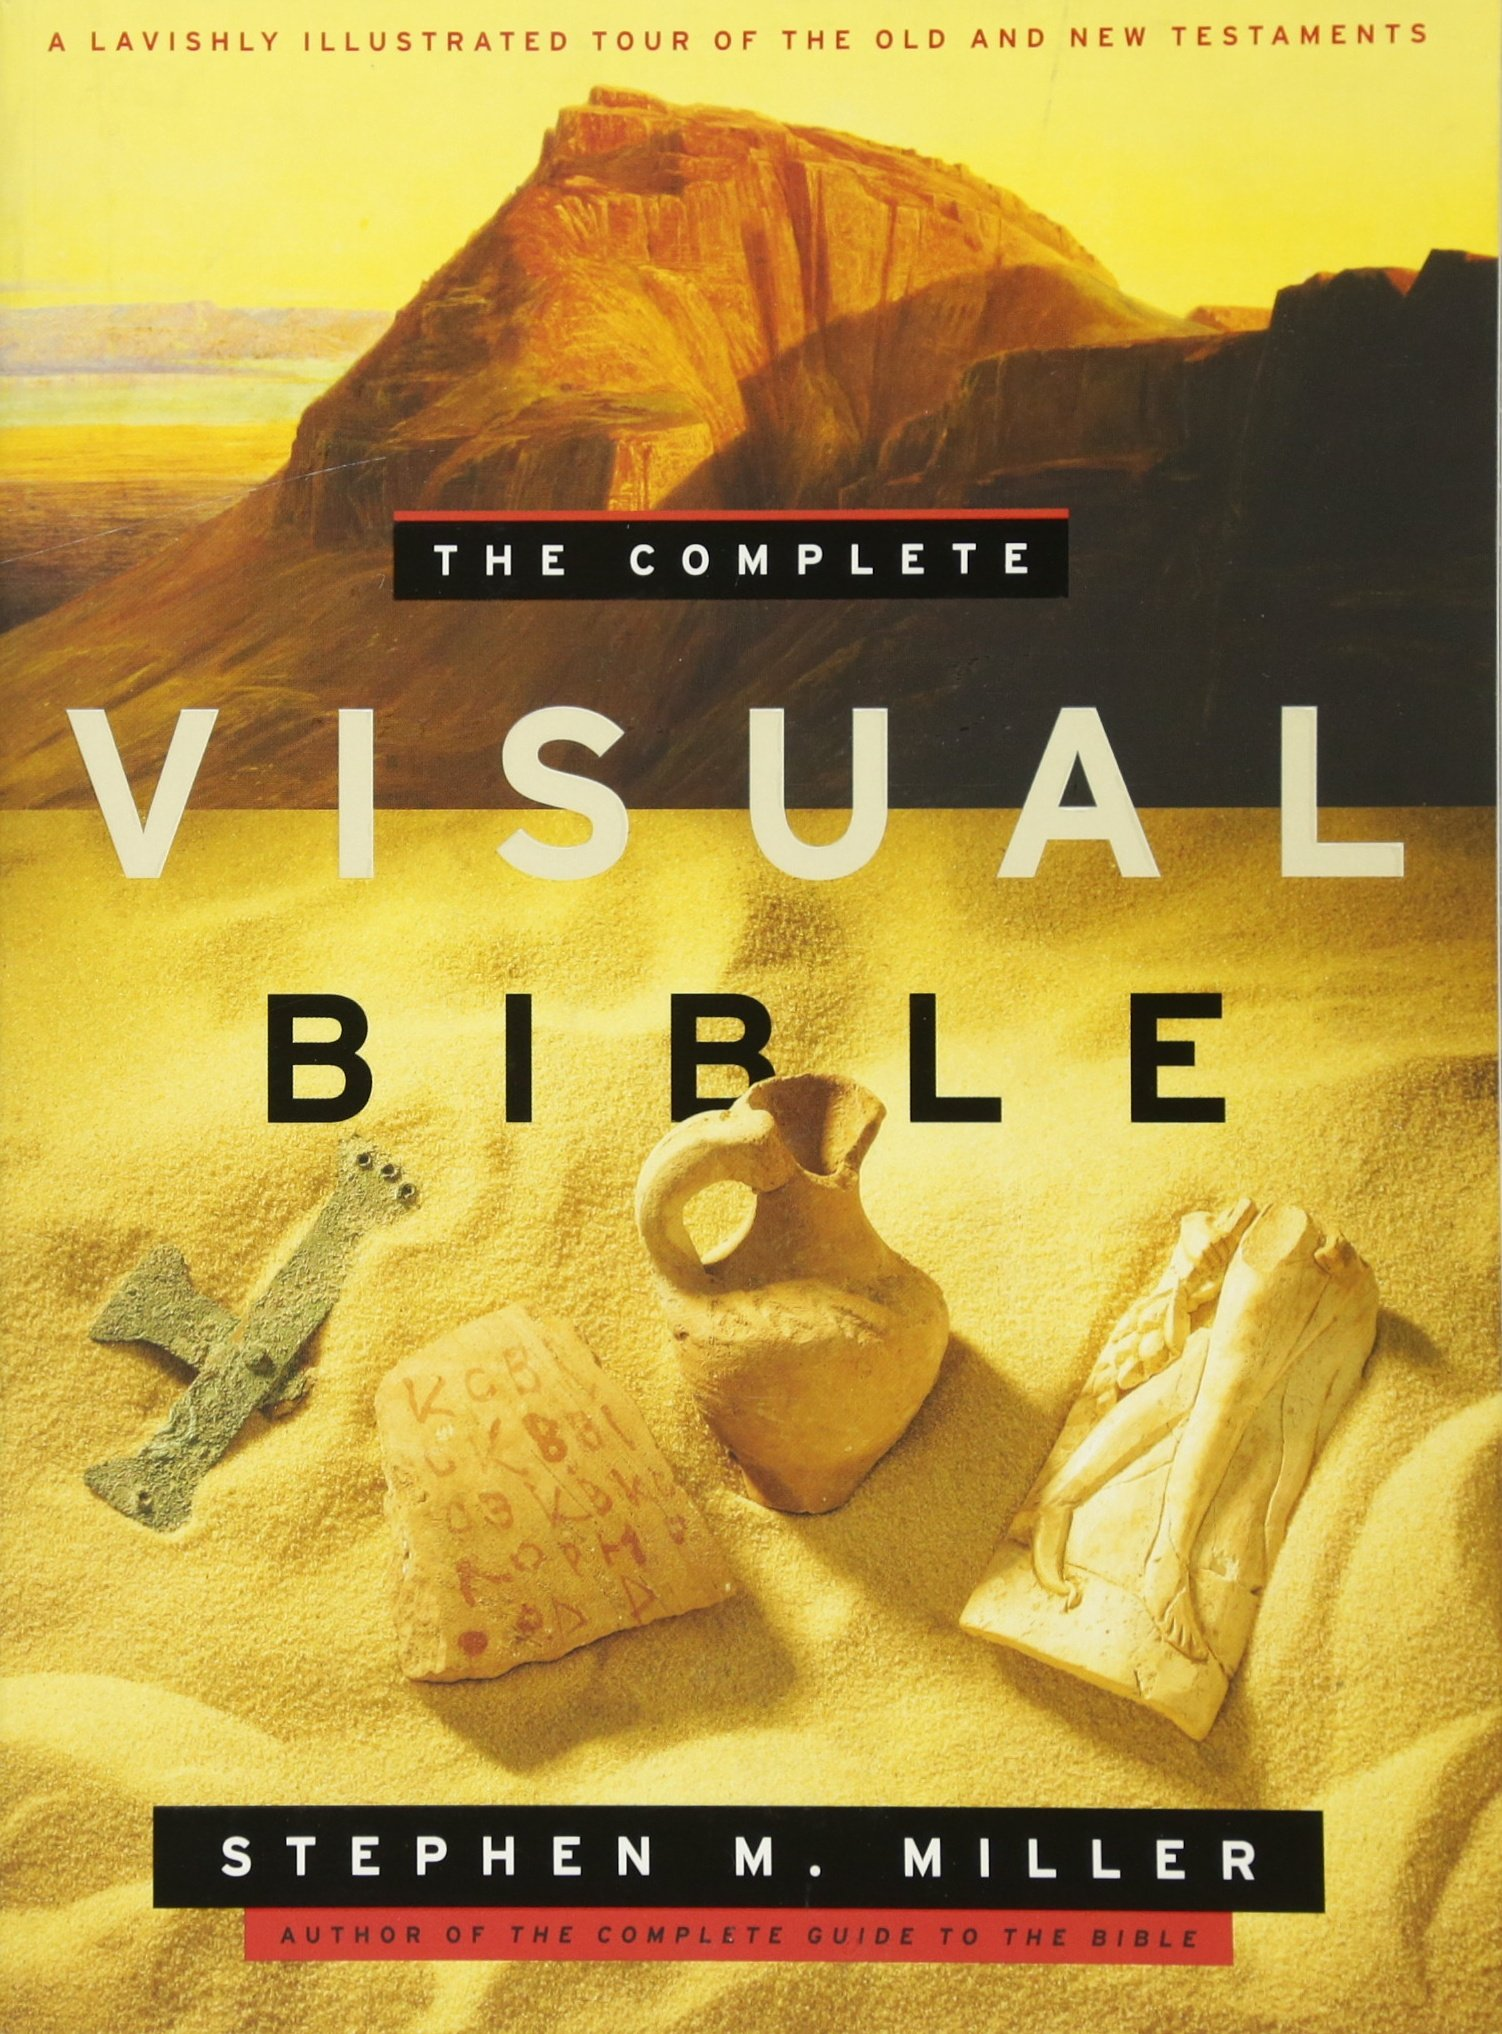 The Complete Visual Bible Miller Stephen M 9781602606883 Amazon Com Books